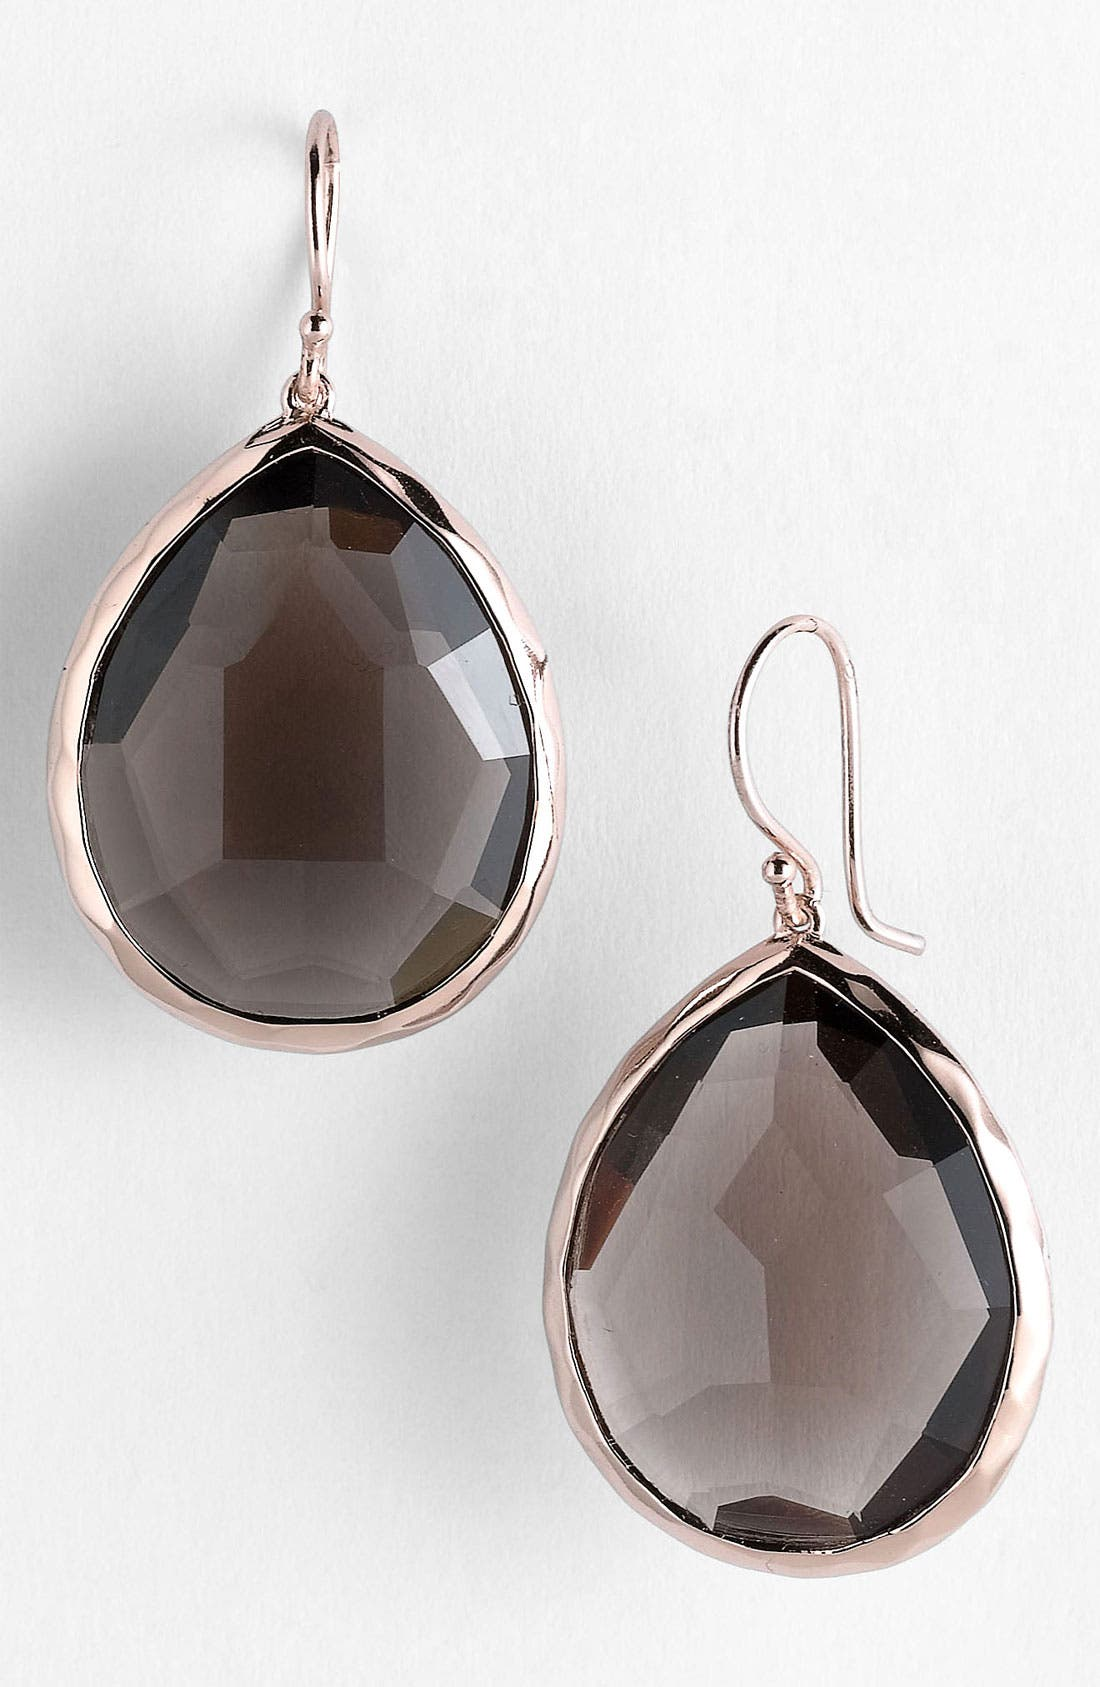 Main Image - Ippolita 'Rock Candy' Rosé Large Teardrop Earrings